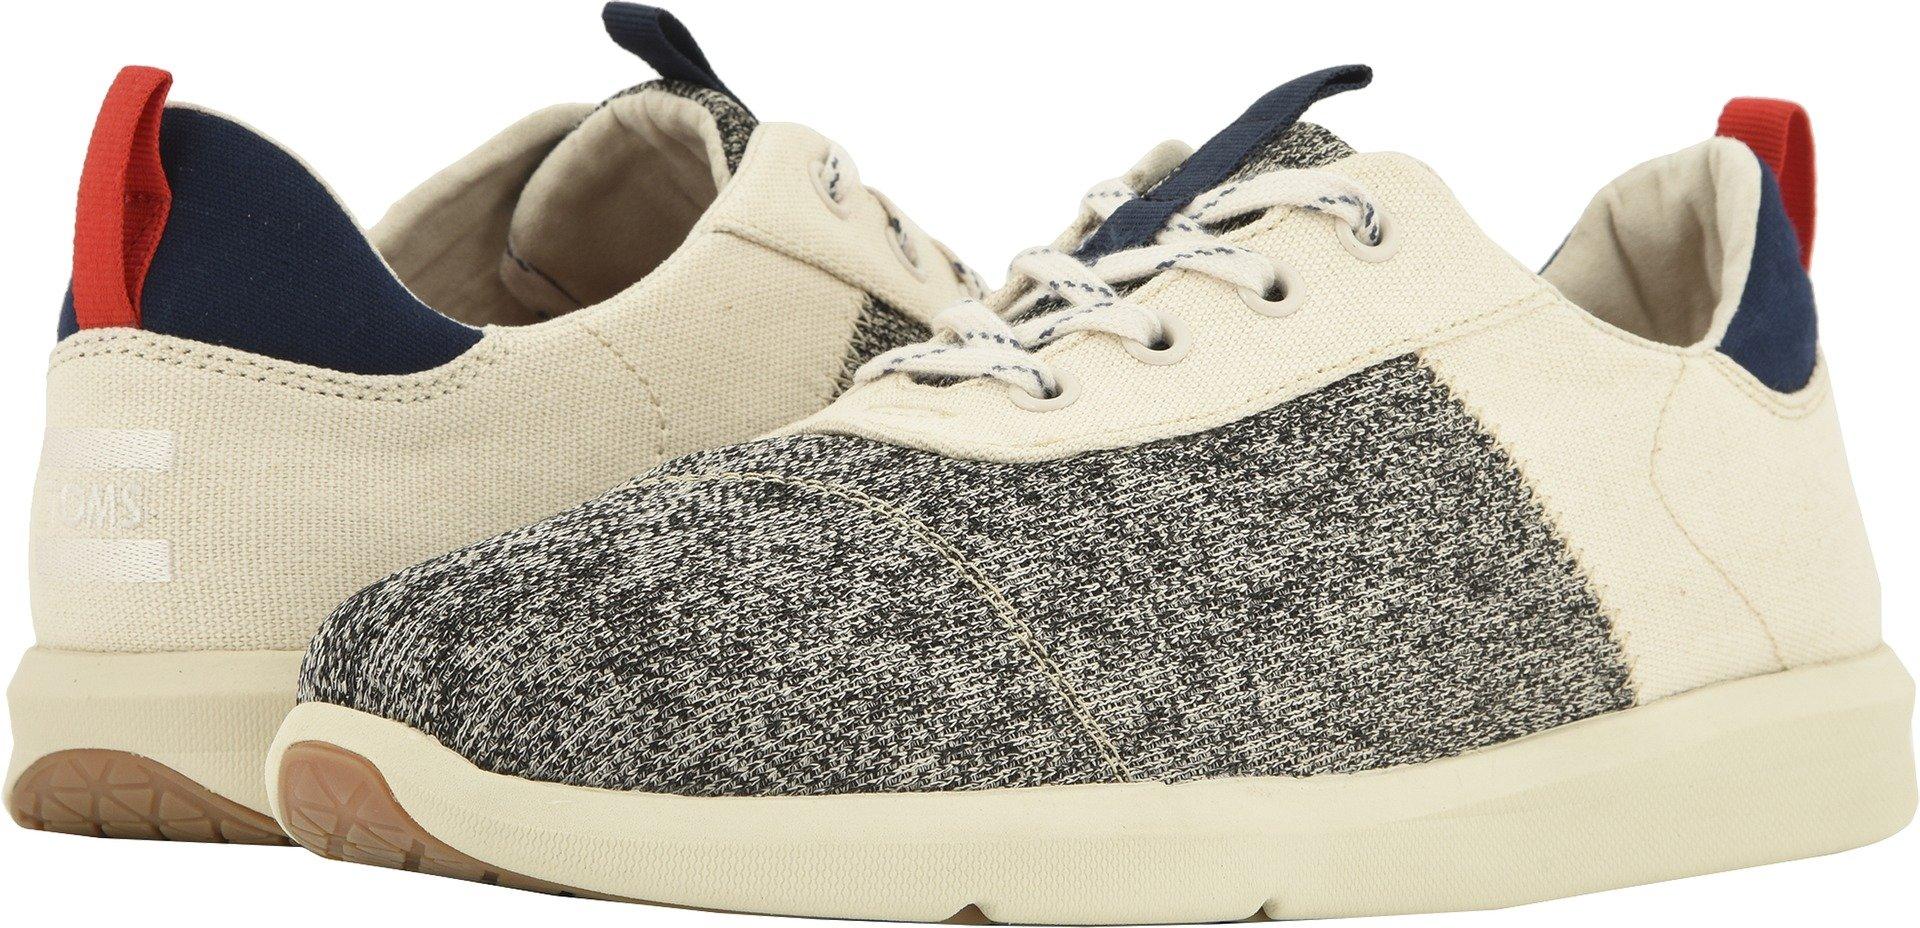 TOMS Men's Cabrillo Cotton/Poly Sneaker, Size: 11.5 D(M) US, Color: Birch Technical Knit